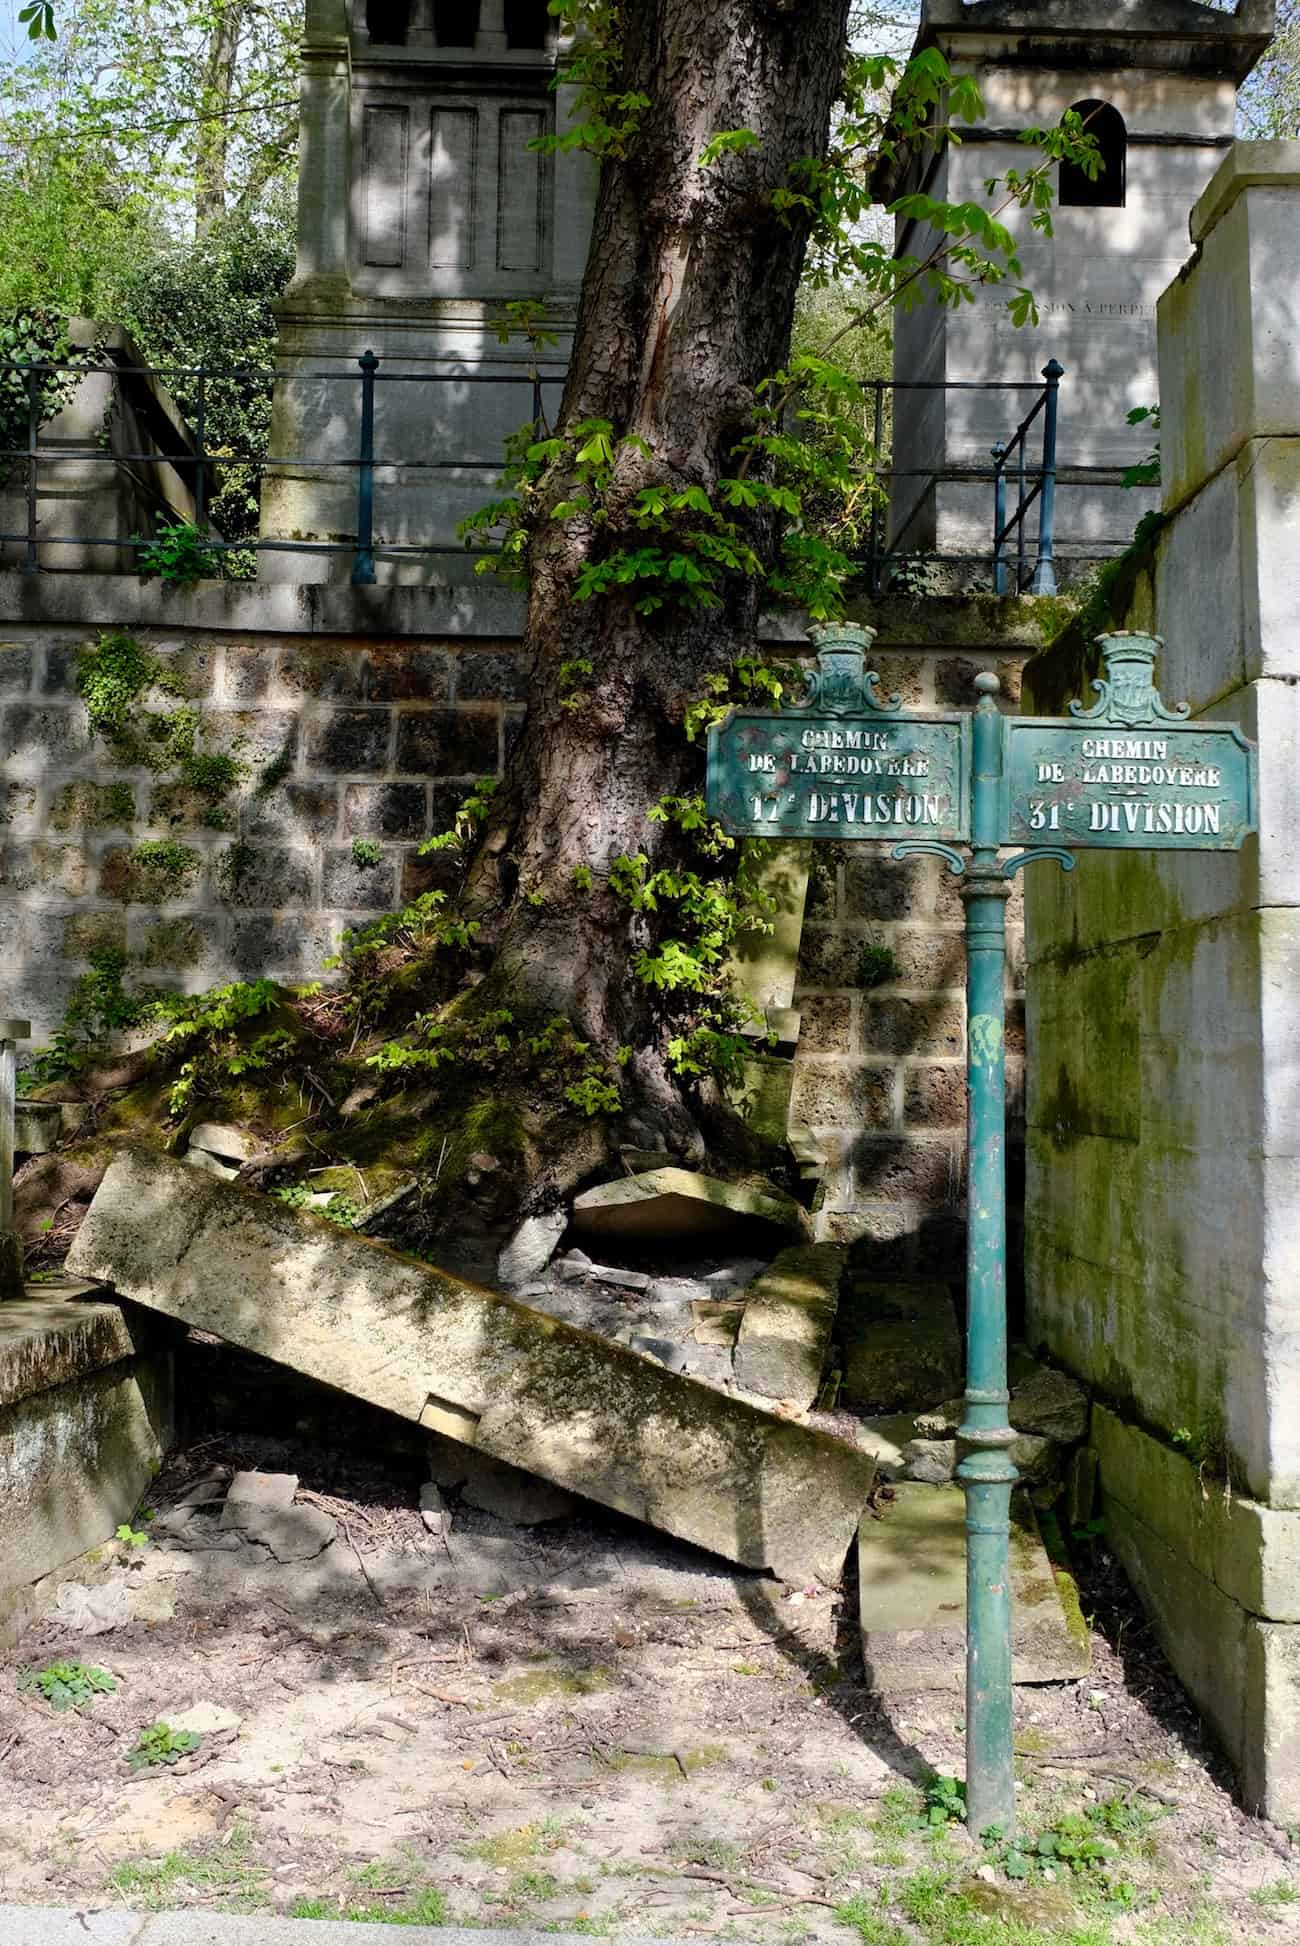 cimetière-pere-lachaise-visite-paris20em-balade